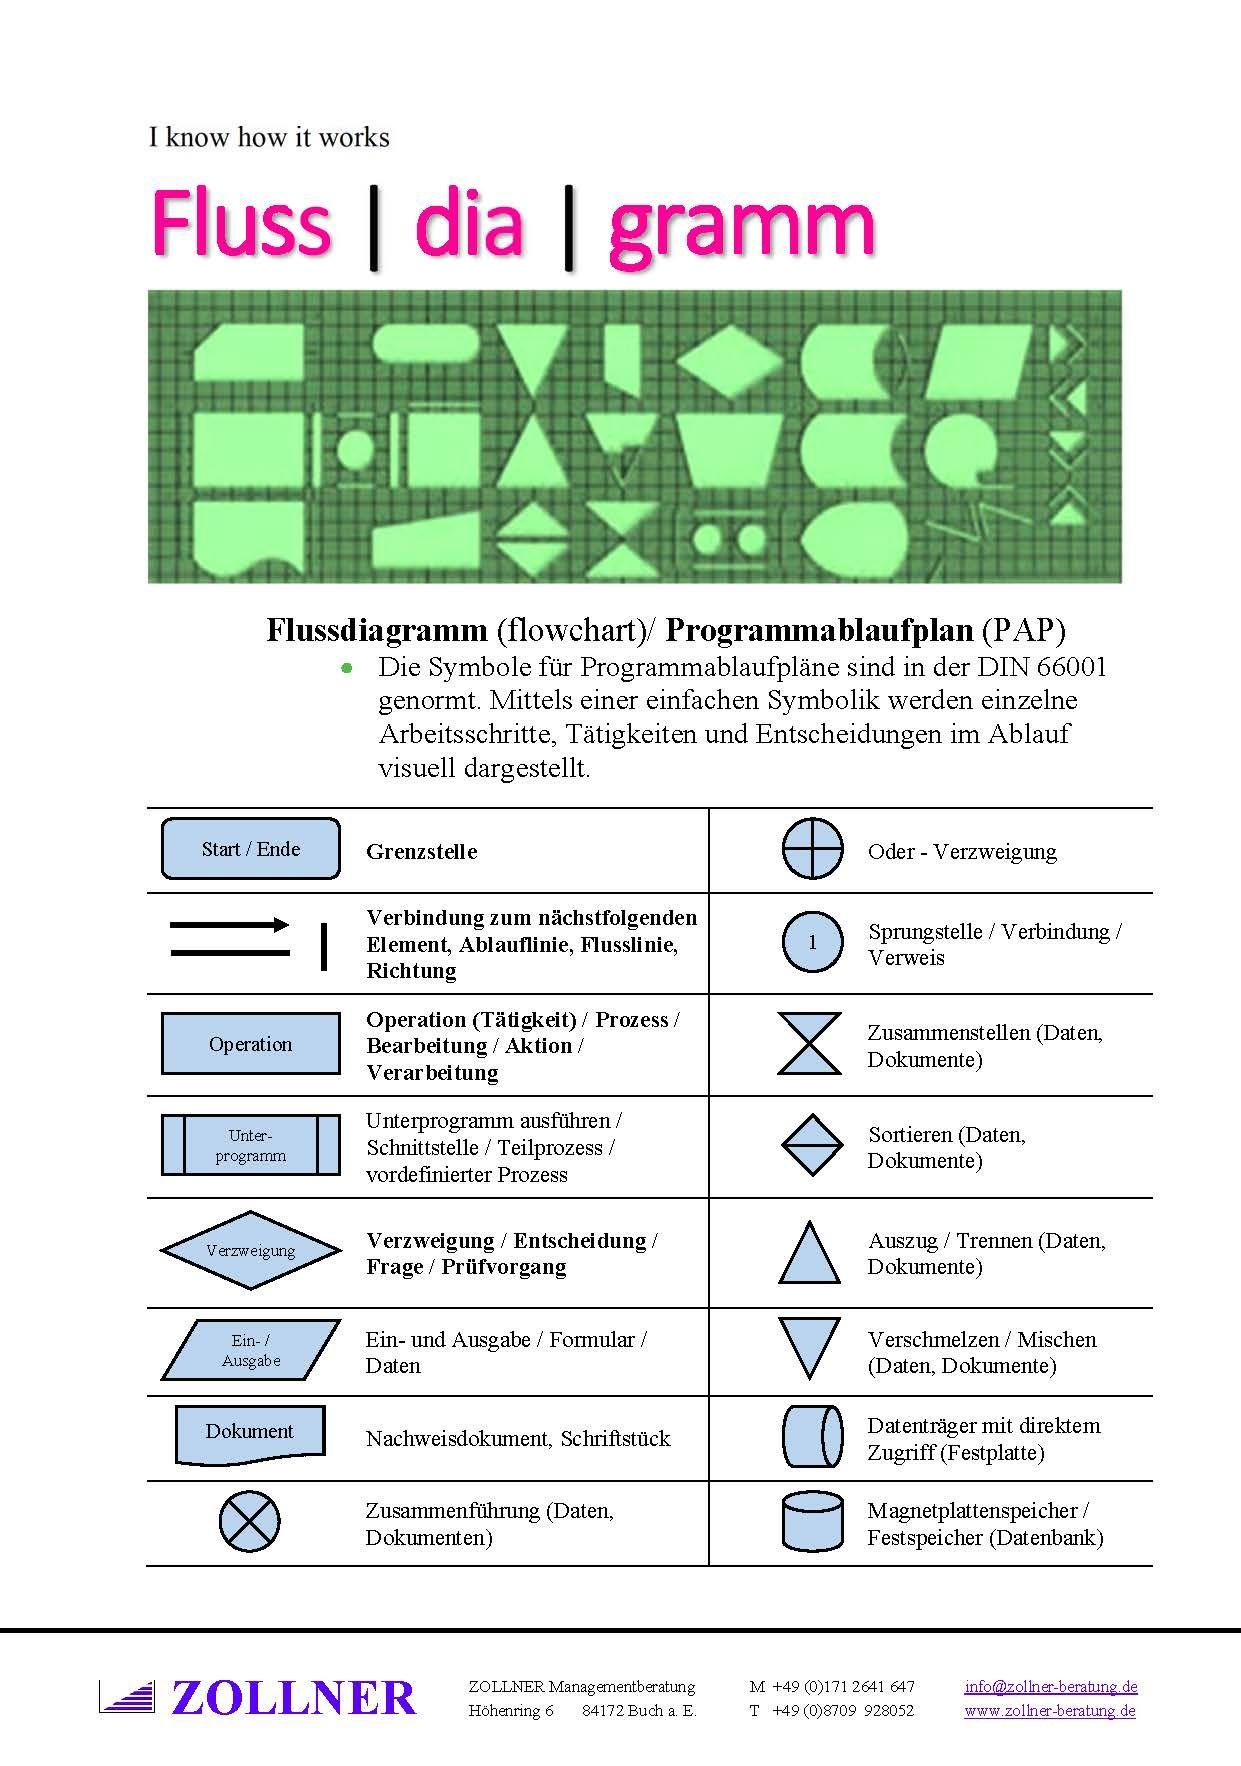 Flussdiagramm Flowchart Programmablaufplan Pap Symbole Wolfgang Zollner Flussdiagramm Programmablaufplan Excel Tipps